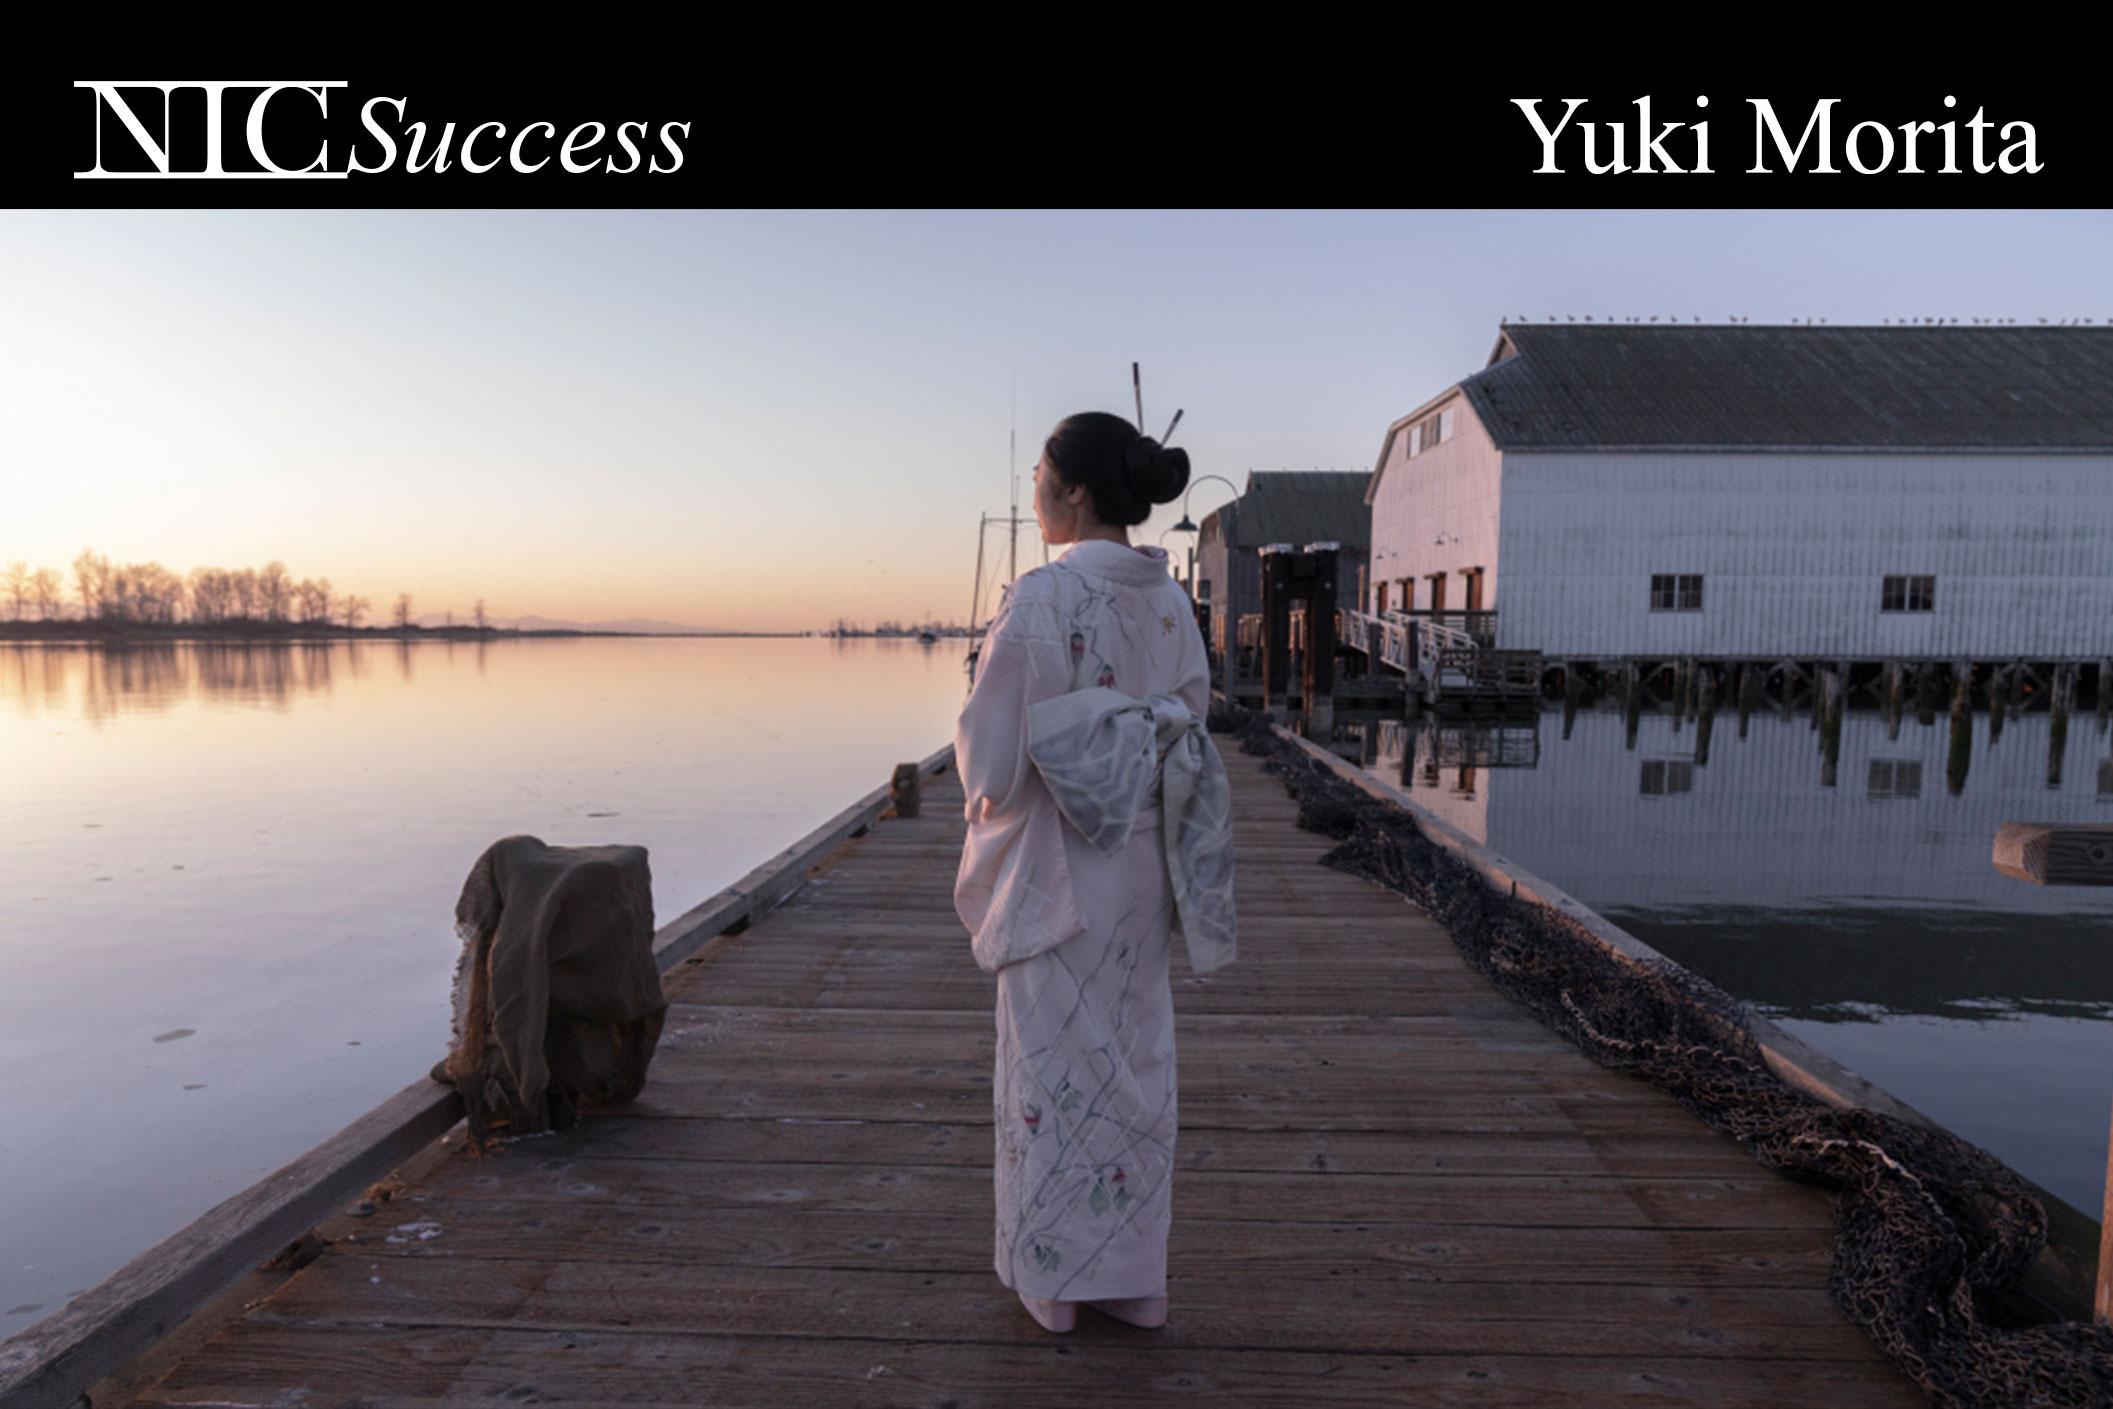 Yuki Morita's memorable role